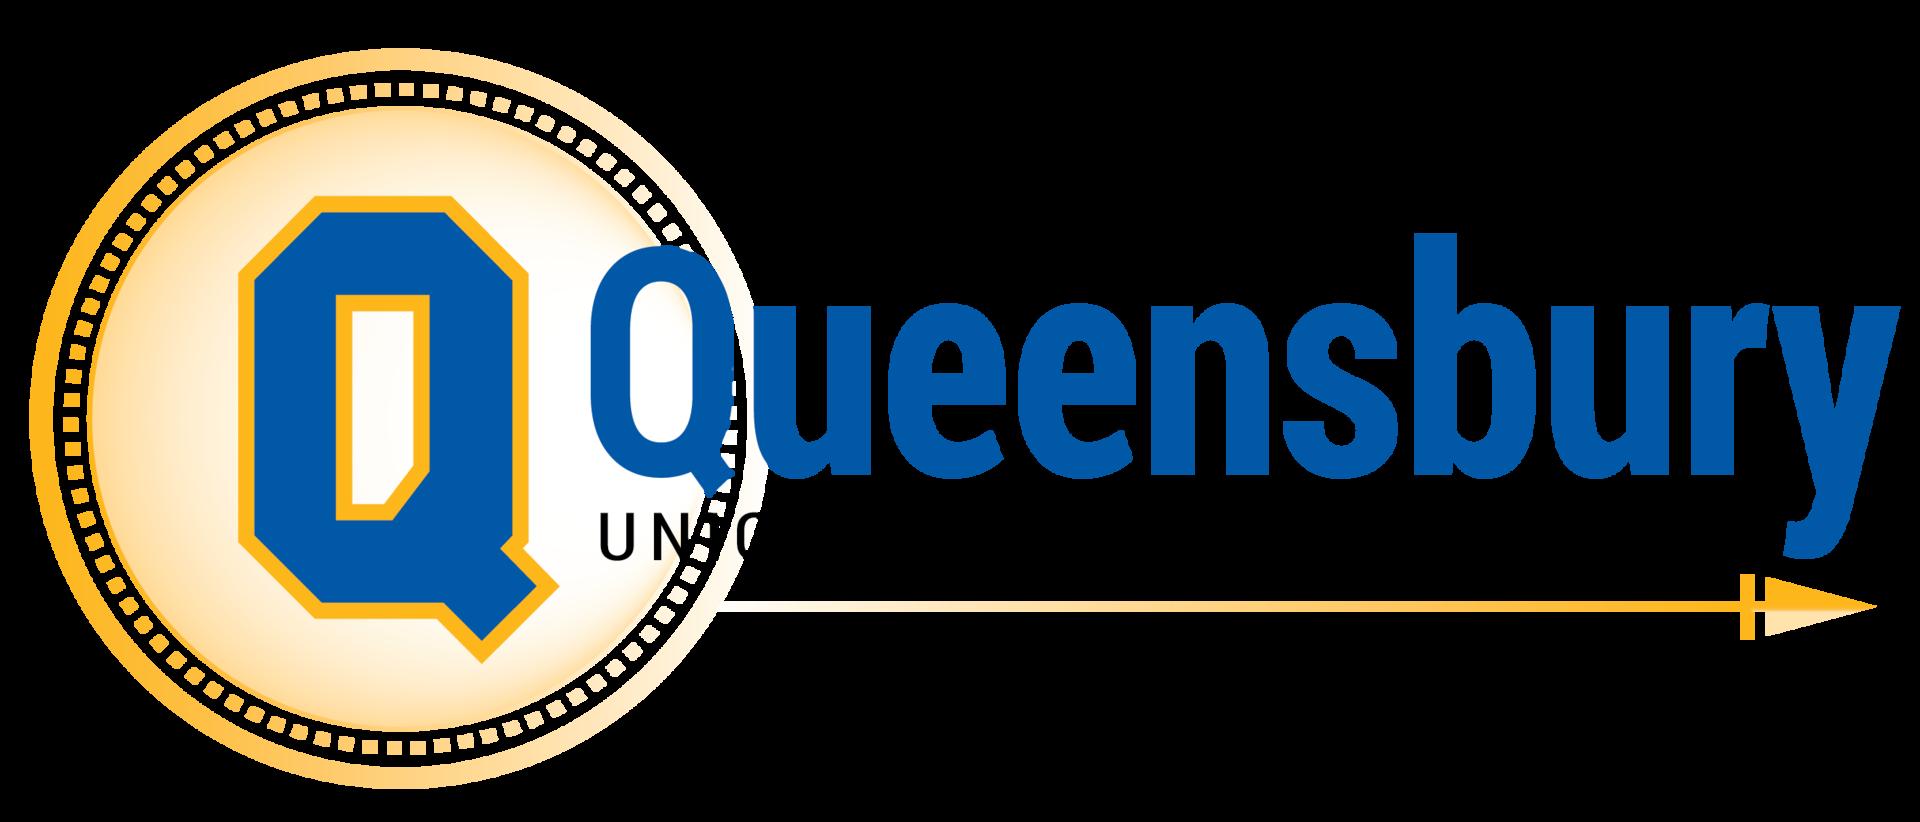 Queensbury Union Free School District Logo